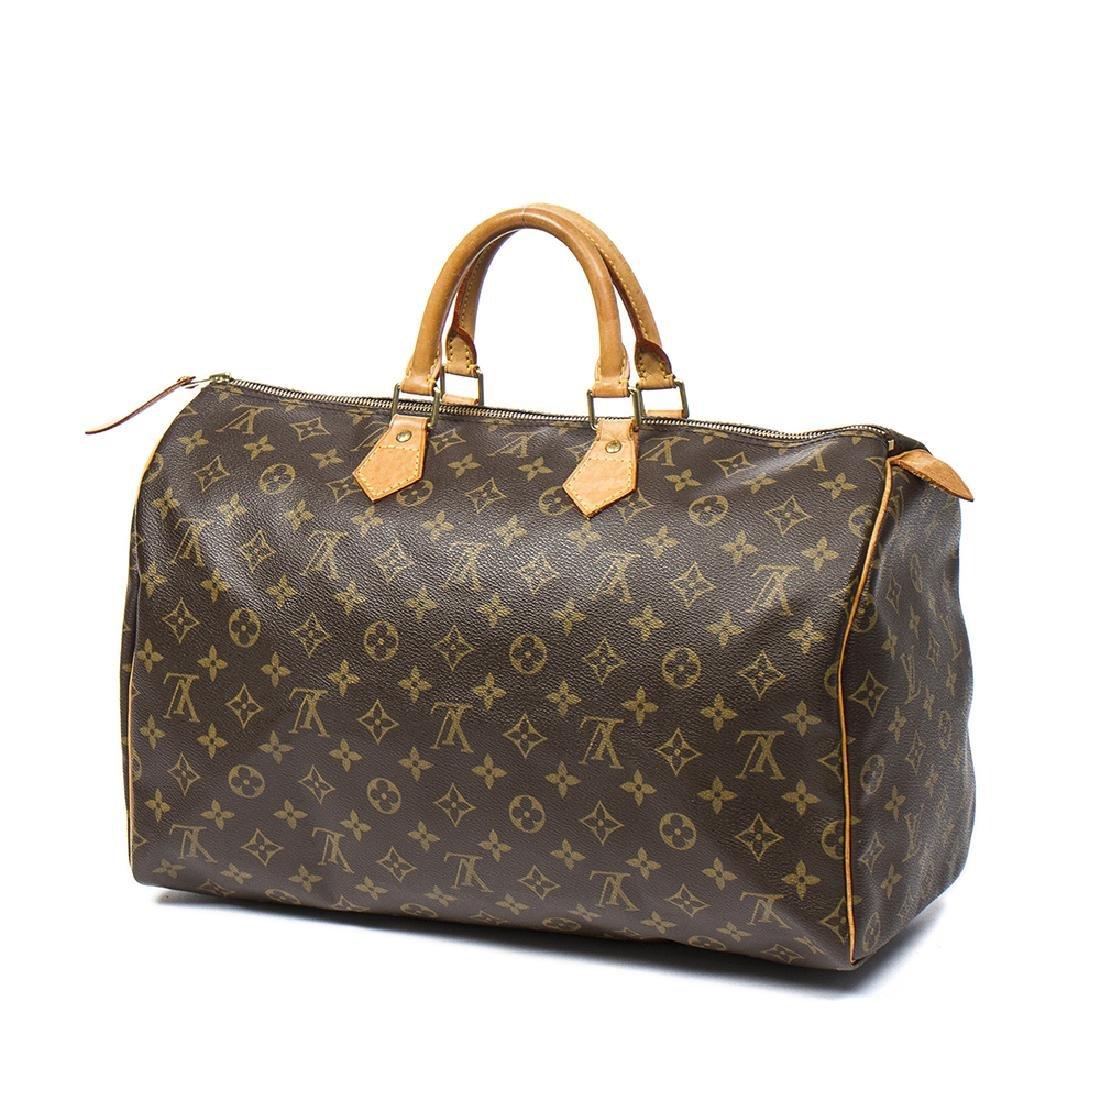 Louis Vuitton Speedy - 3